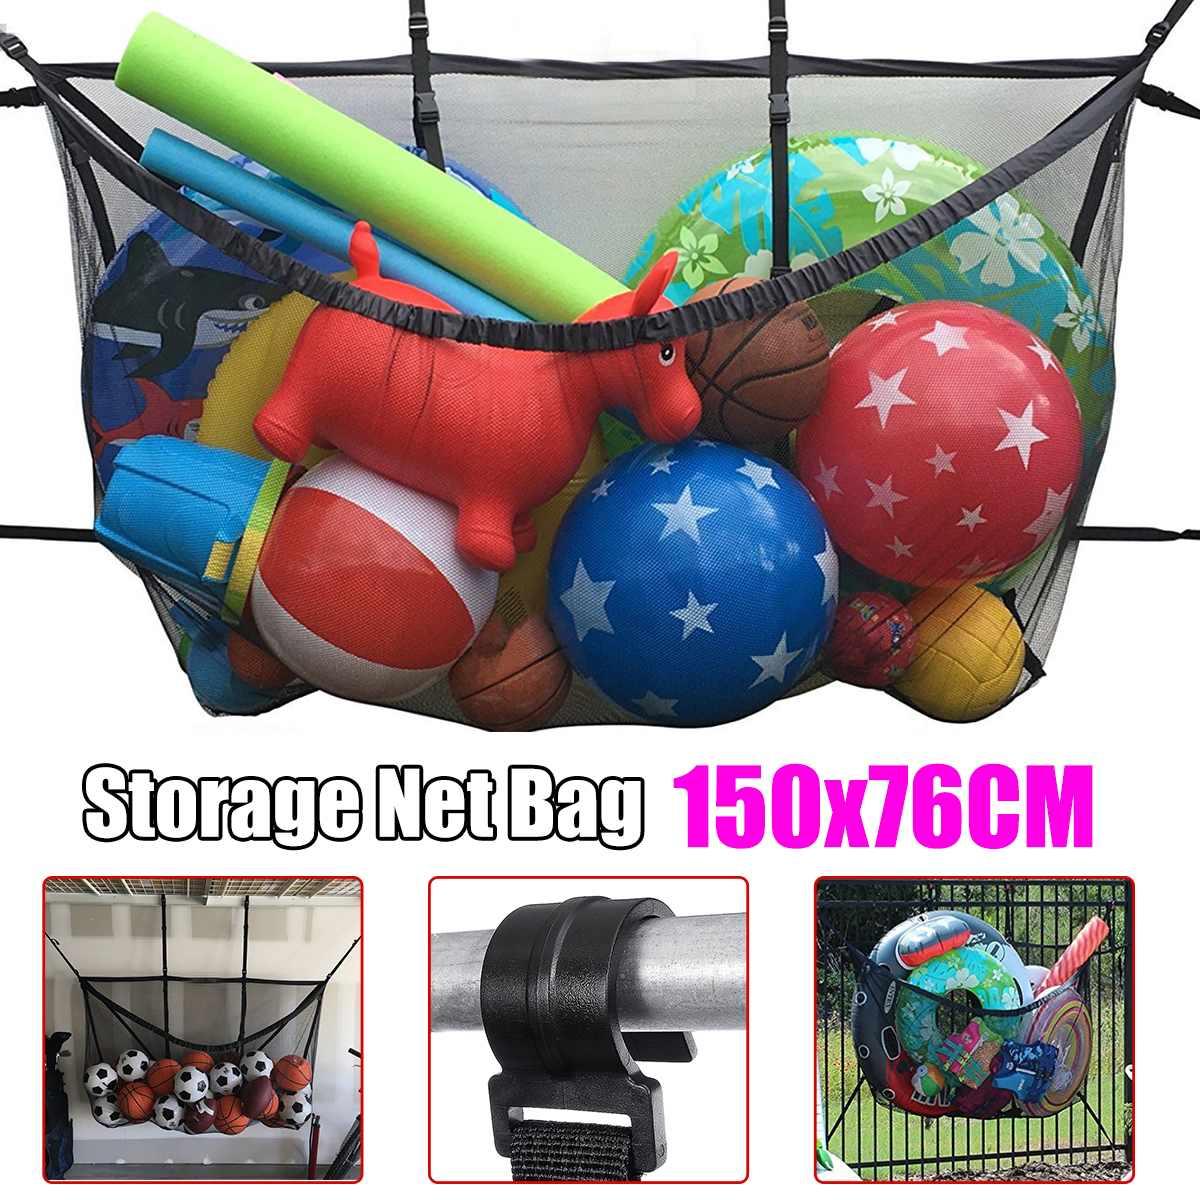 Large-capacity Adjustable Hanging Swimming Pool Storage Bags Net Bag  Football Basketball Inflatable Toys Storage Bags